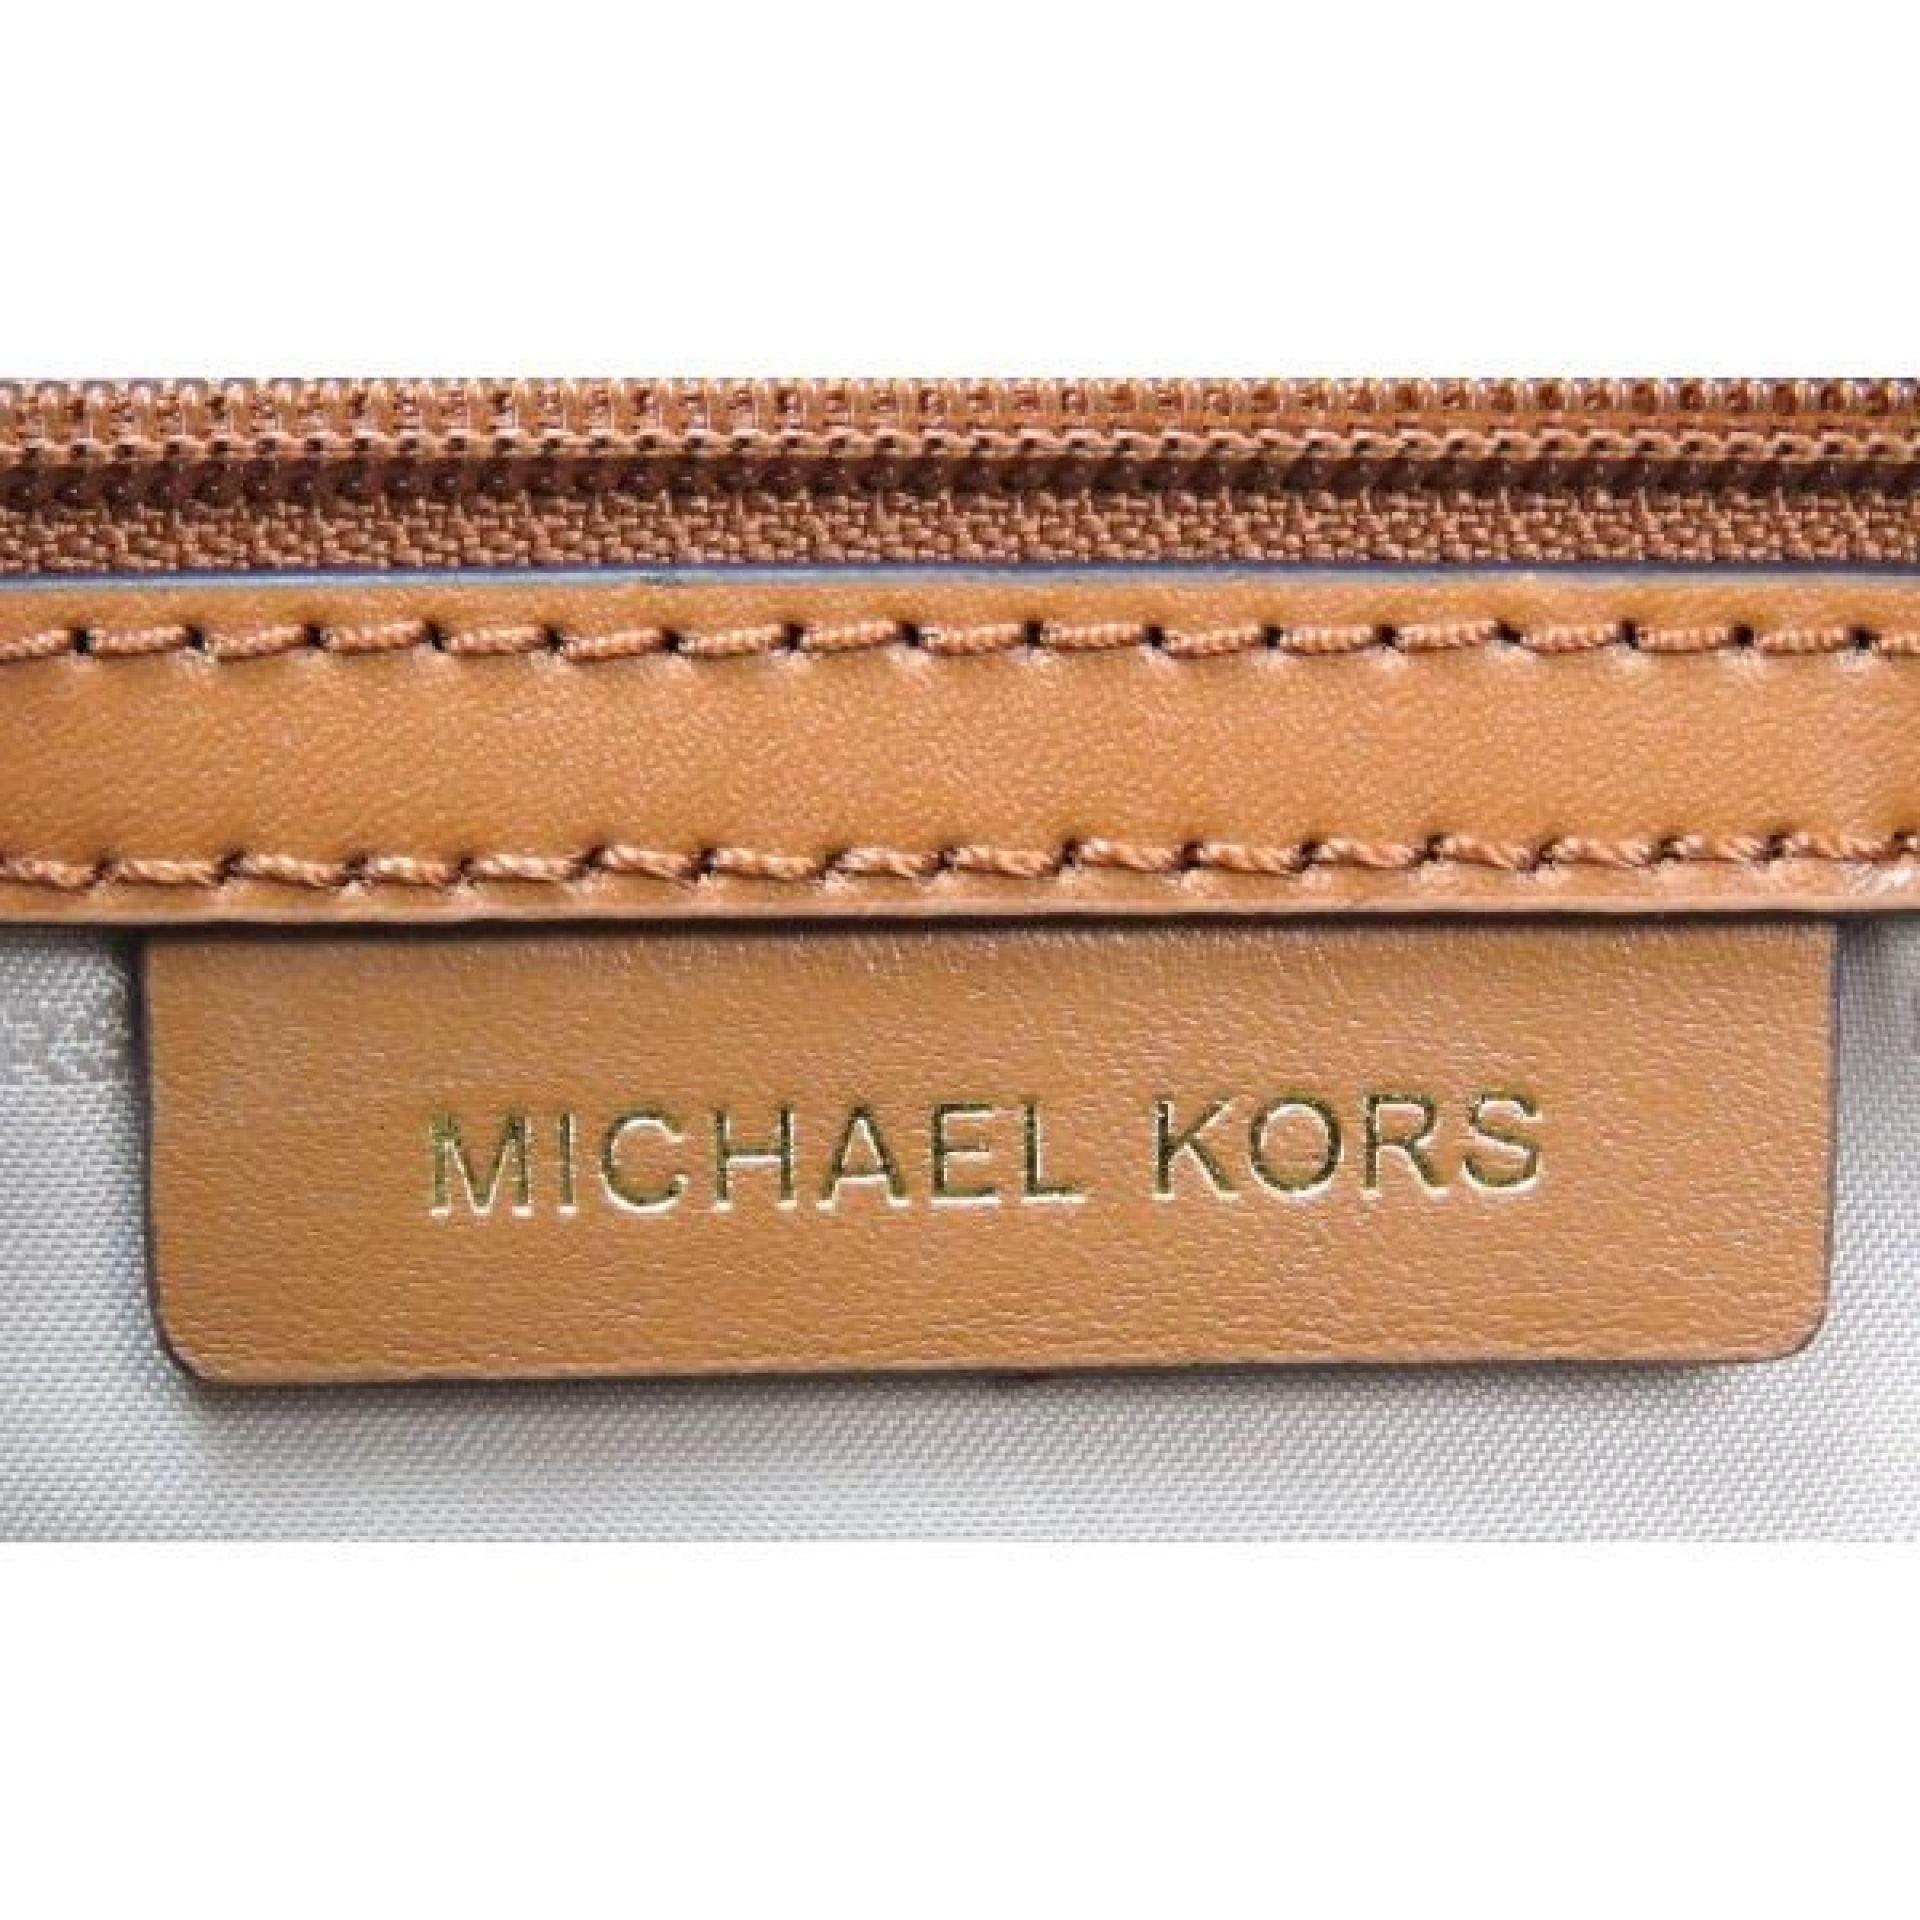 Michael Kors Brown Monogram Canvas Grayson Mercer Convertible Satchel Bag